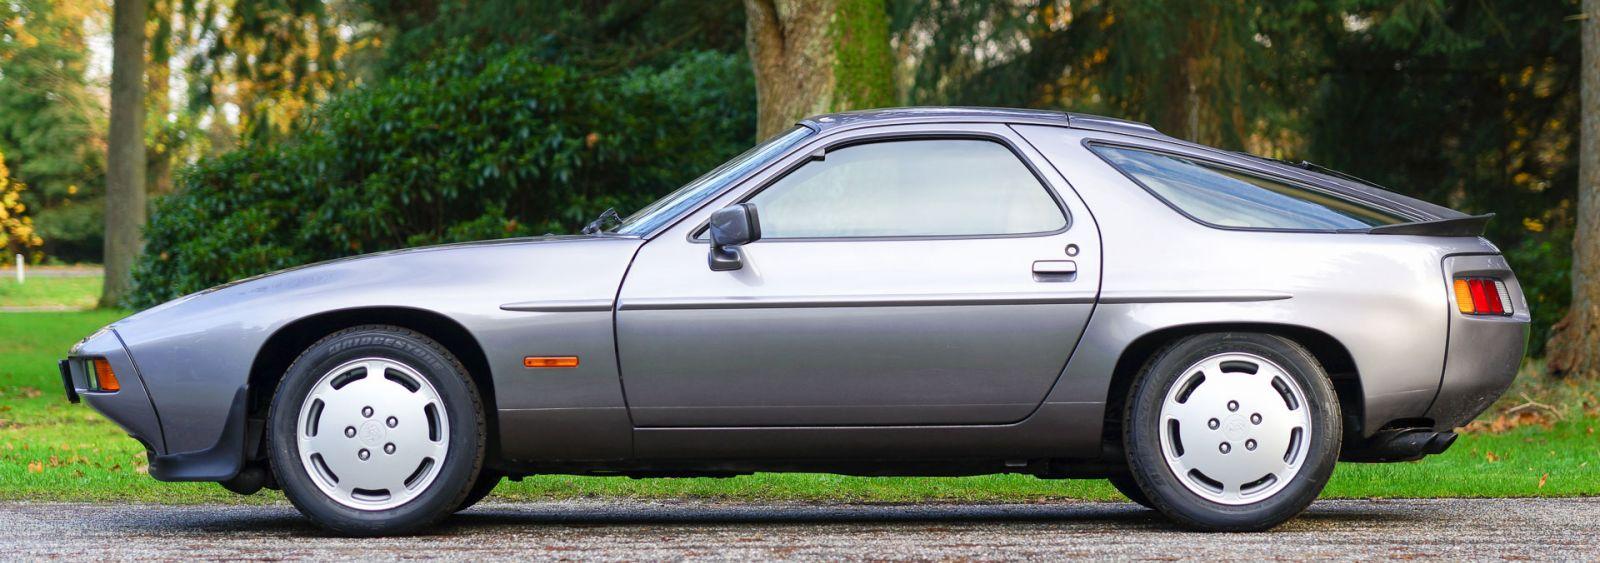 Porsche 928 s 1986 classicargarage fr for Interieur 928